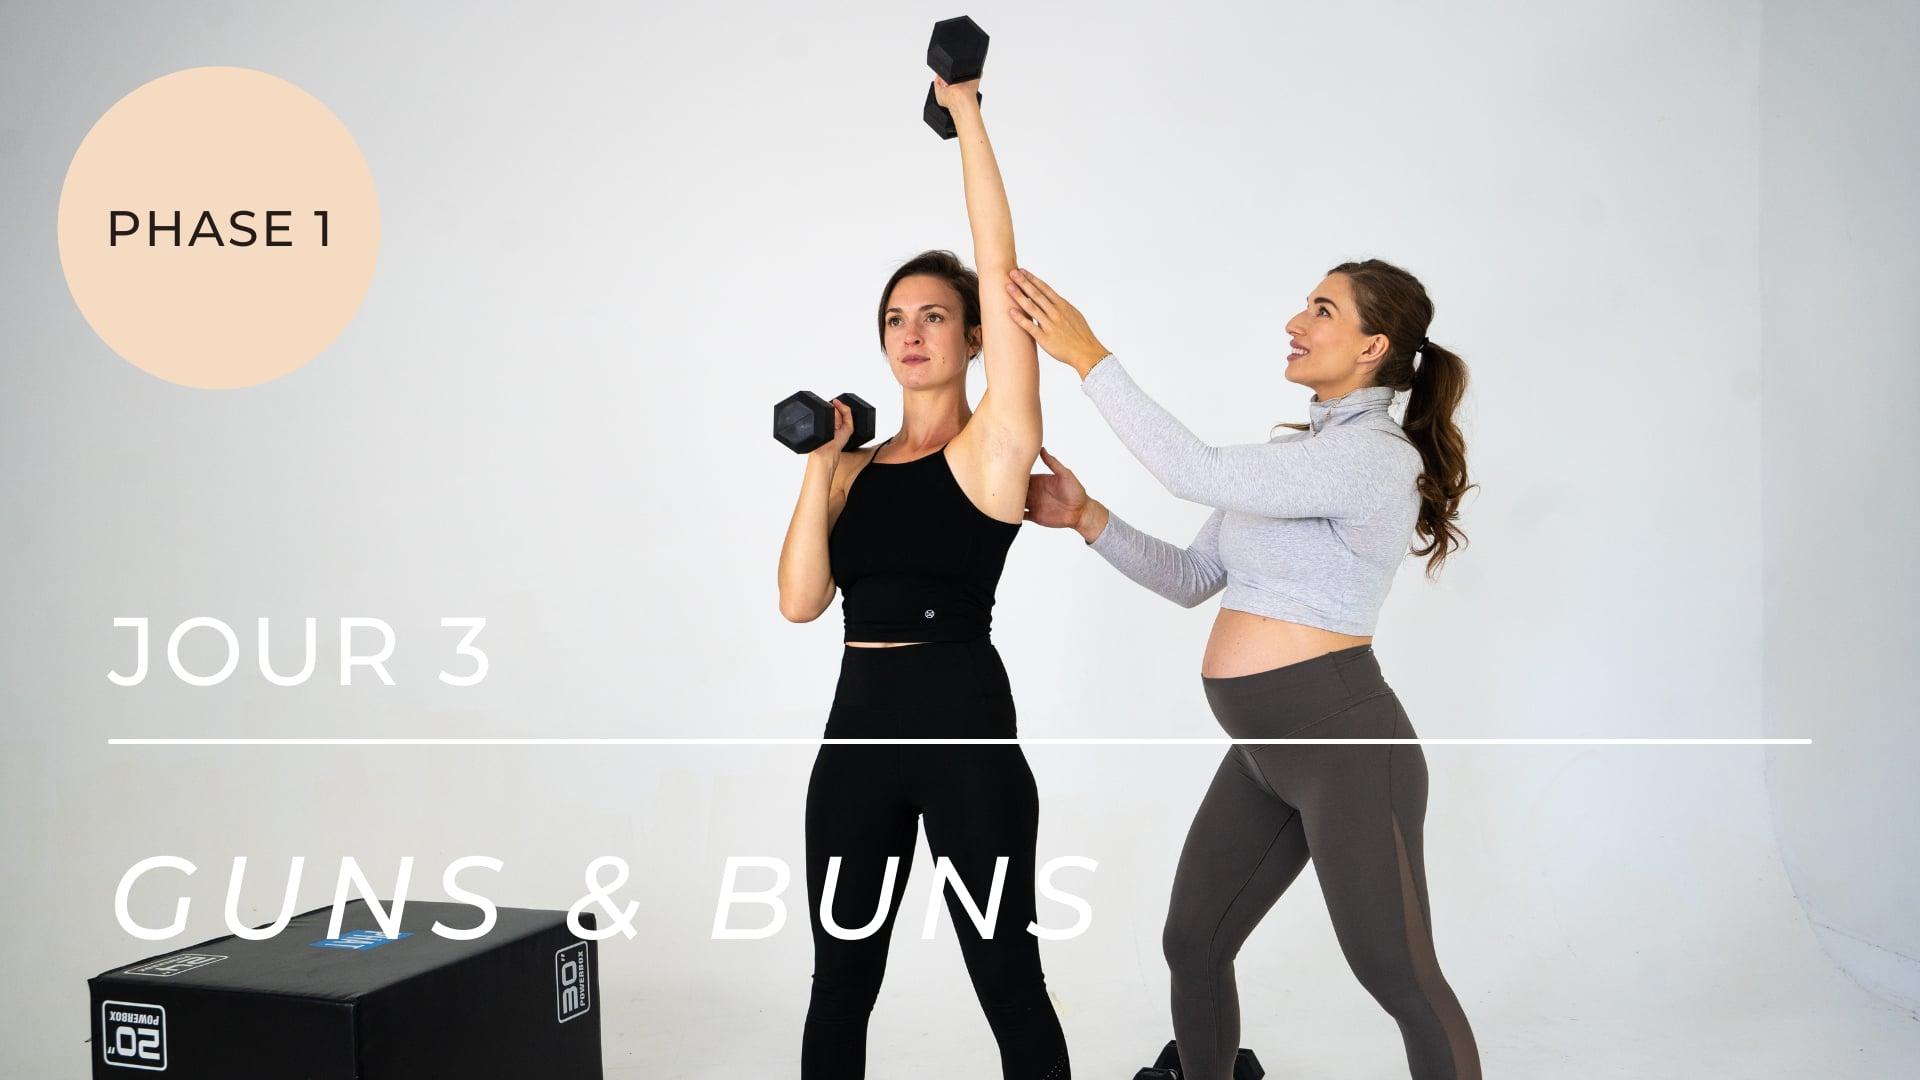 GUNS & BUNS - Jour 3 (Phase 1)